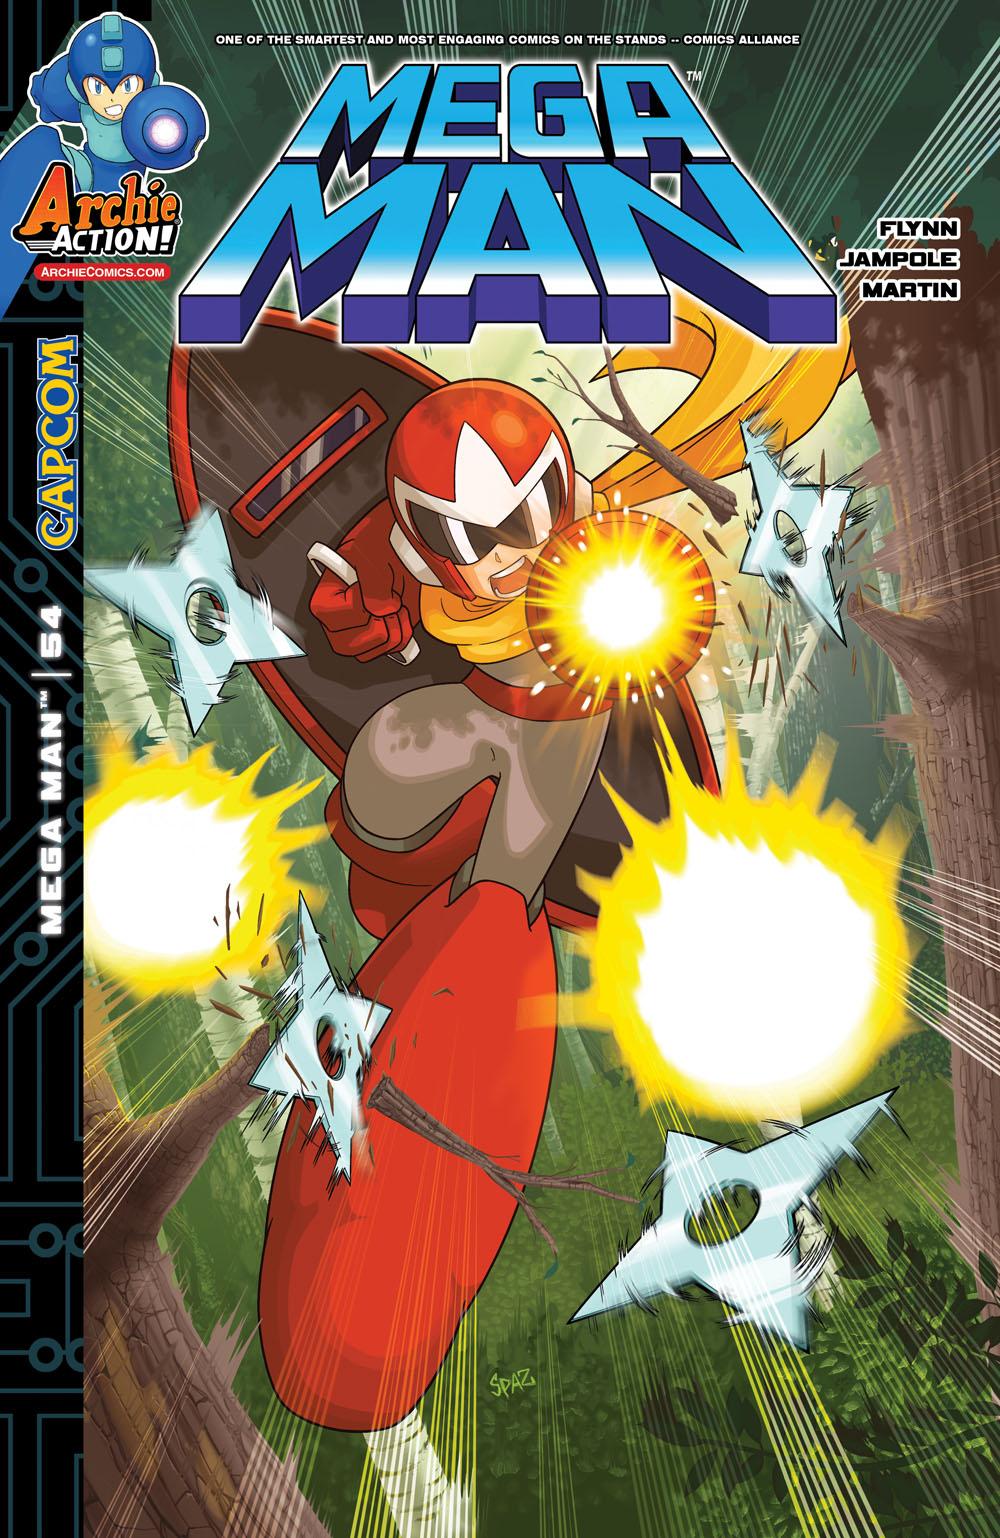 Archie comics archie comics sneak peek of the week major spoilers - Megaman 54